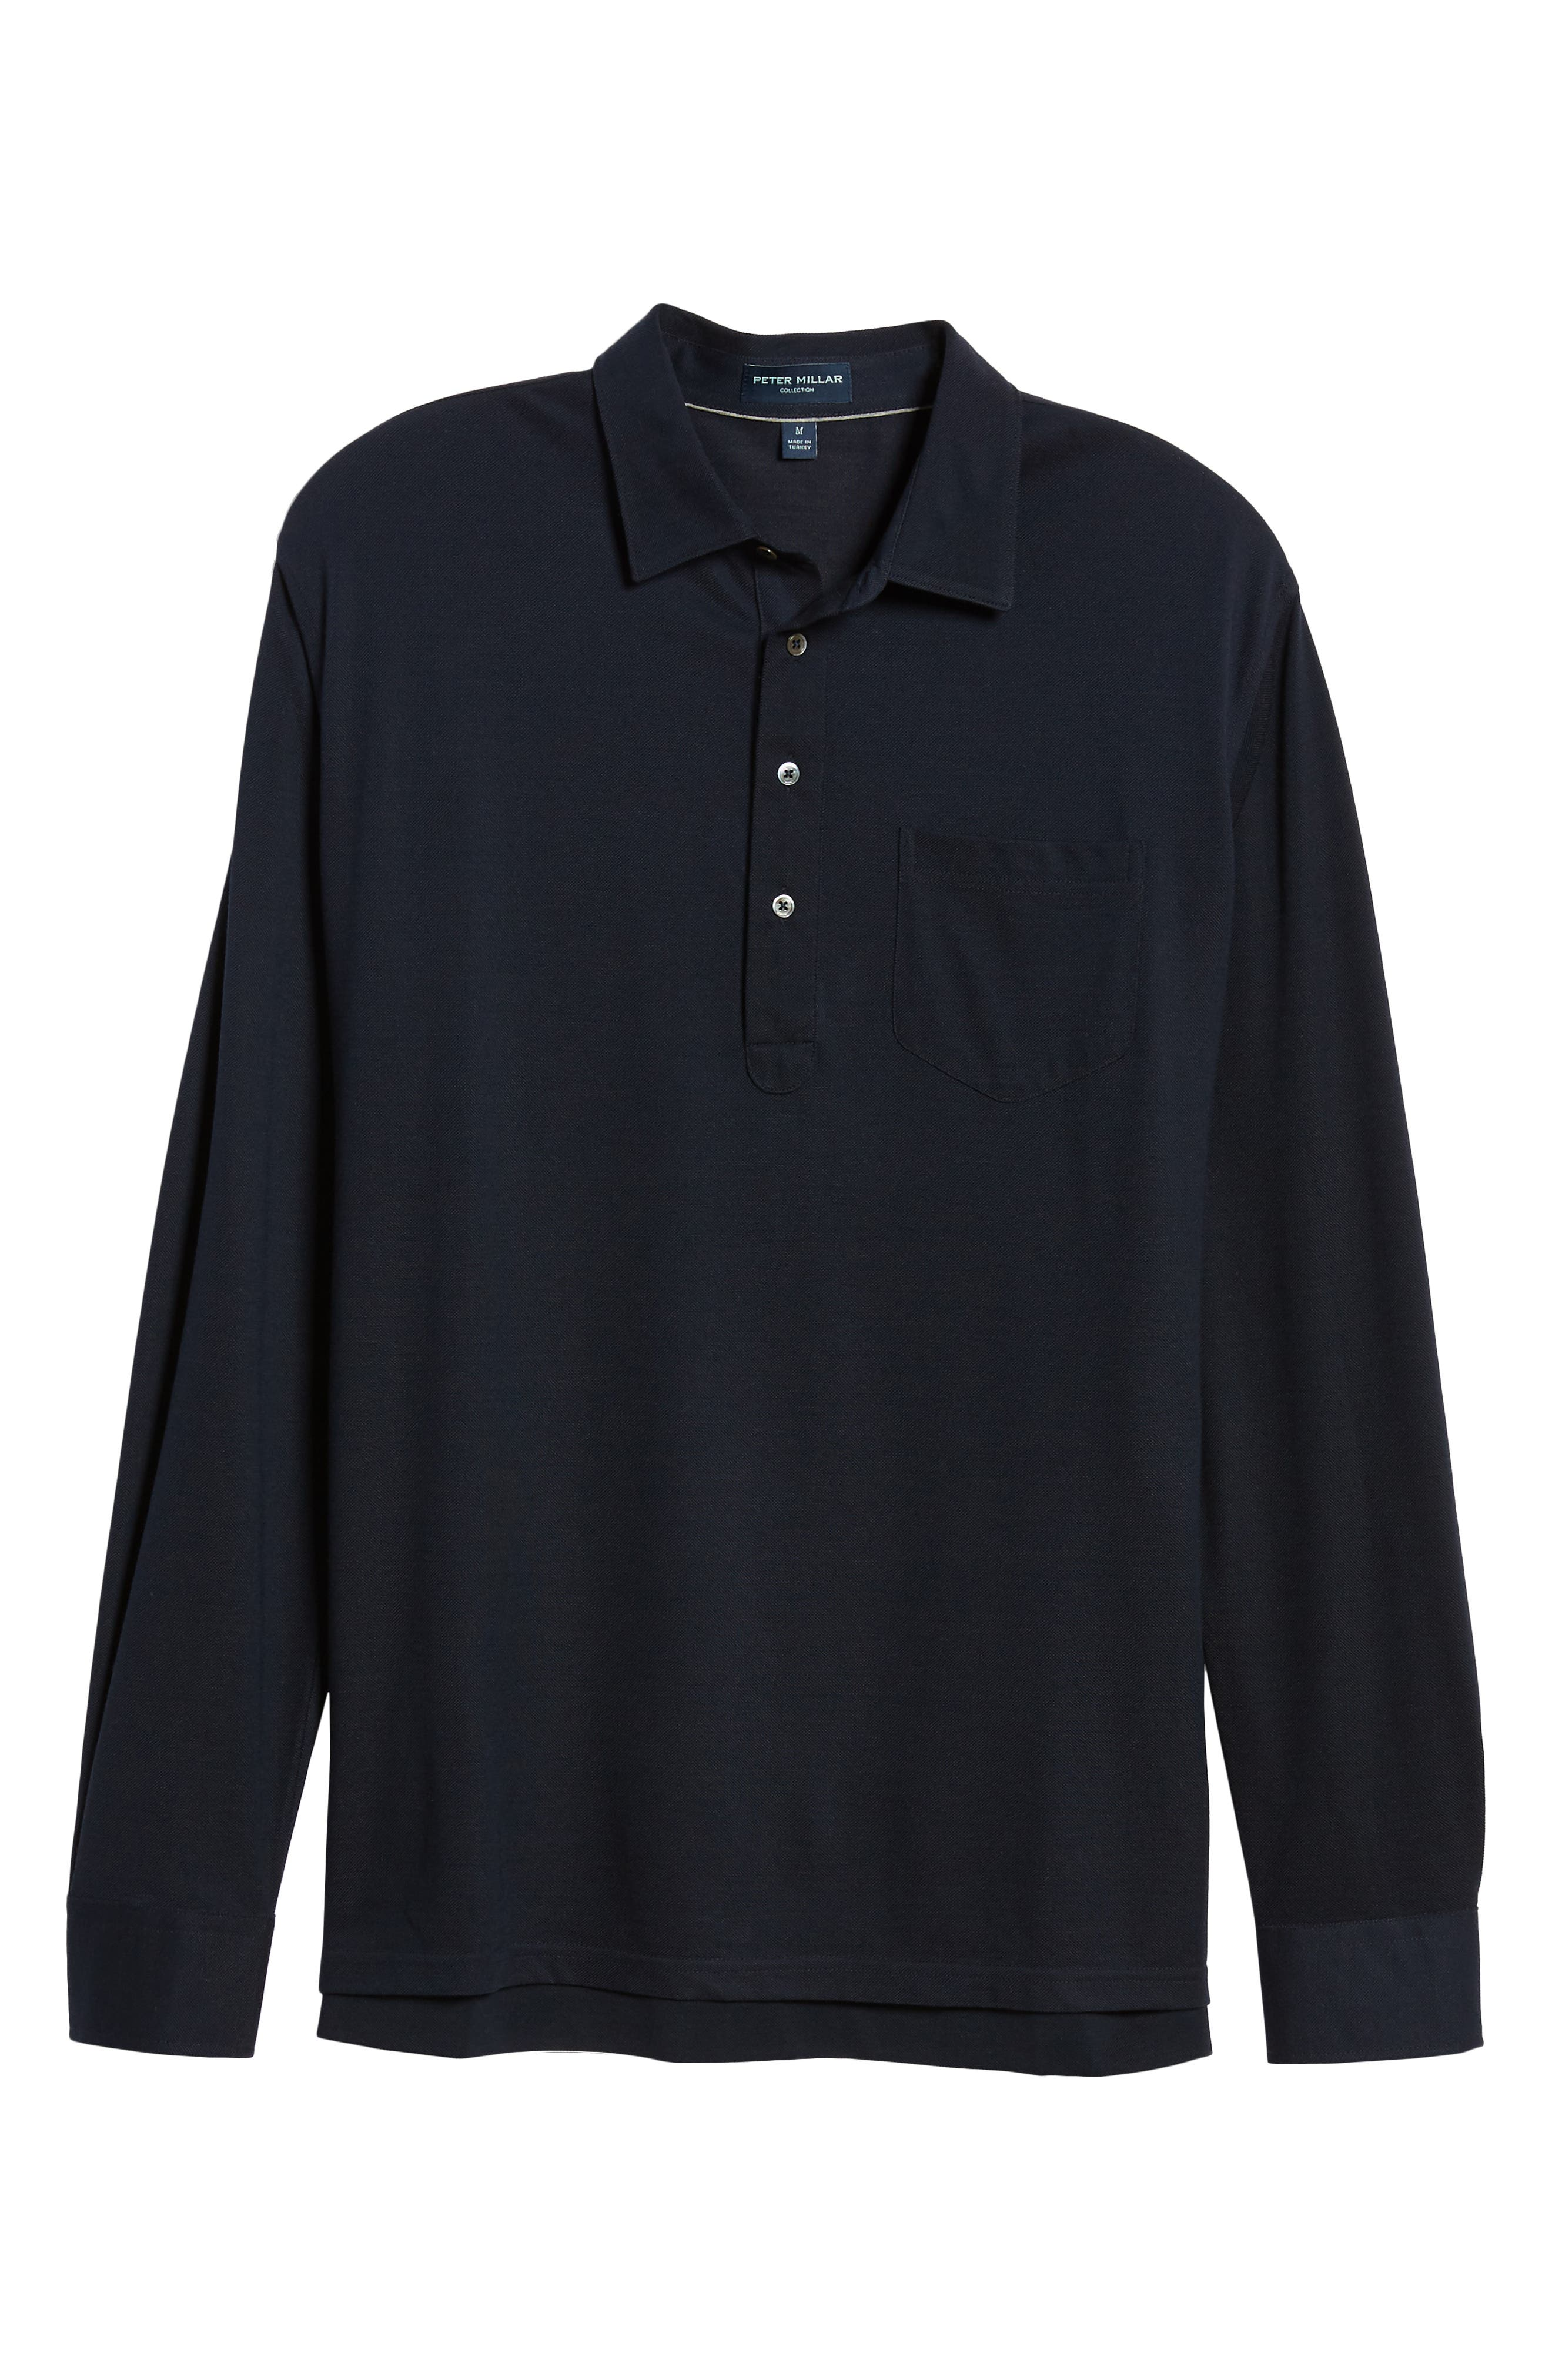 Avon Long Sleeve Silk & Cotton Polo,                             Alternate thumbnail 6, color,                             BARCHETTA